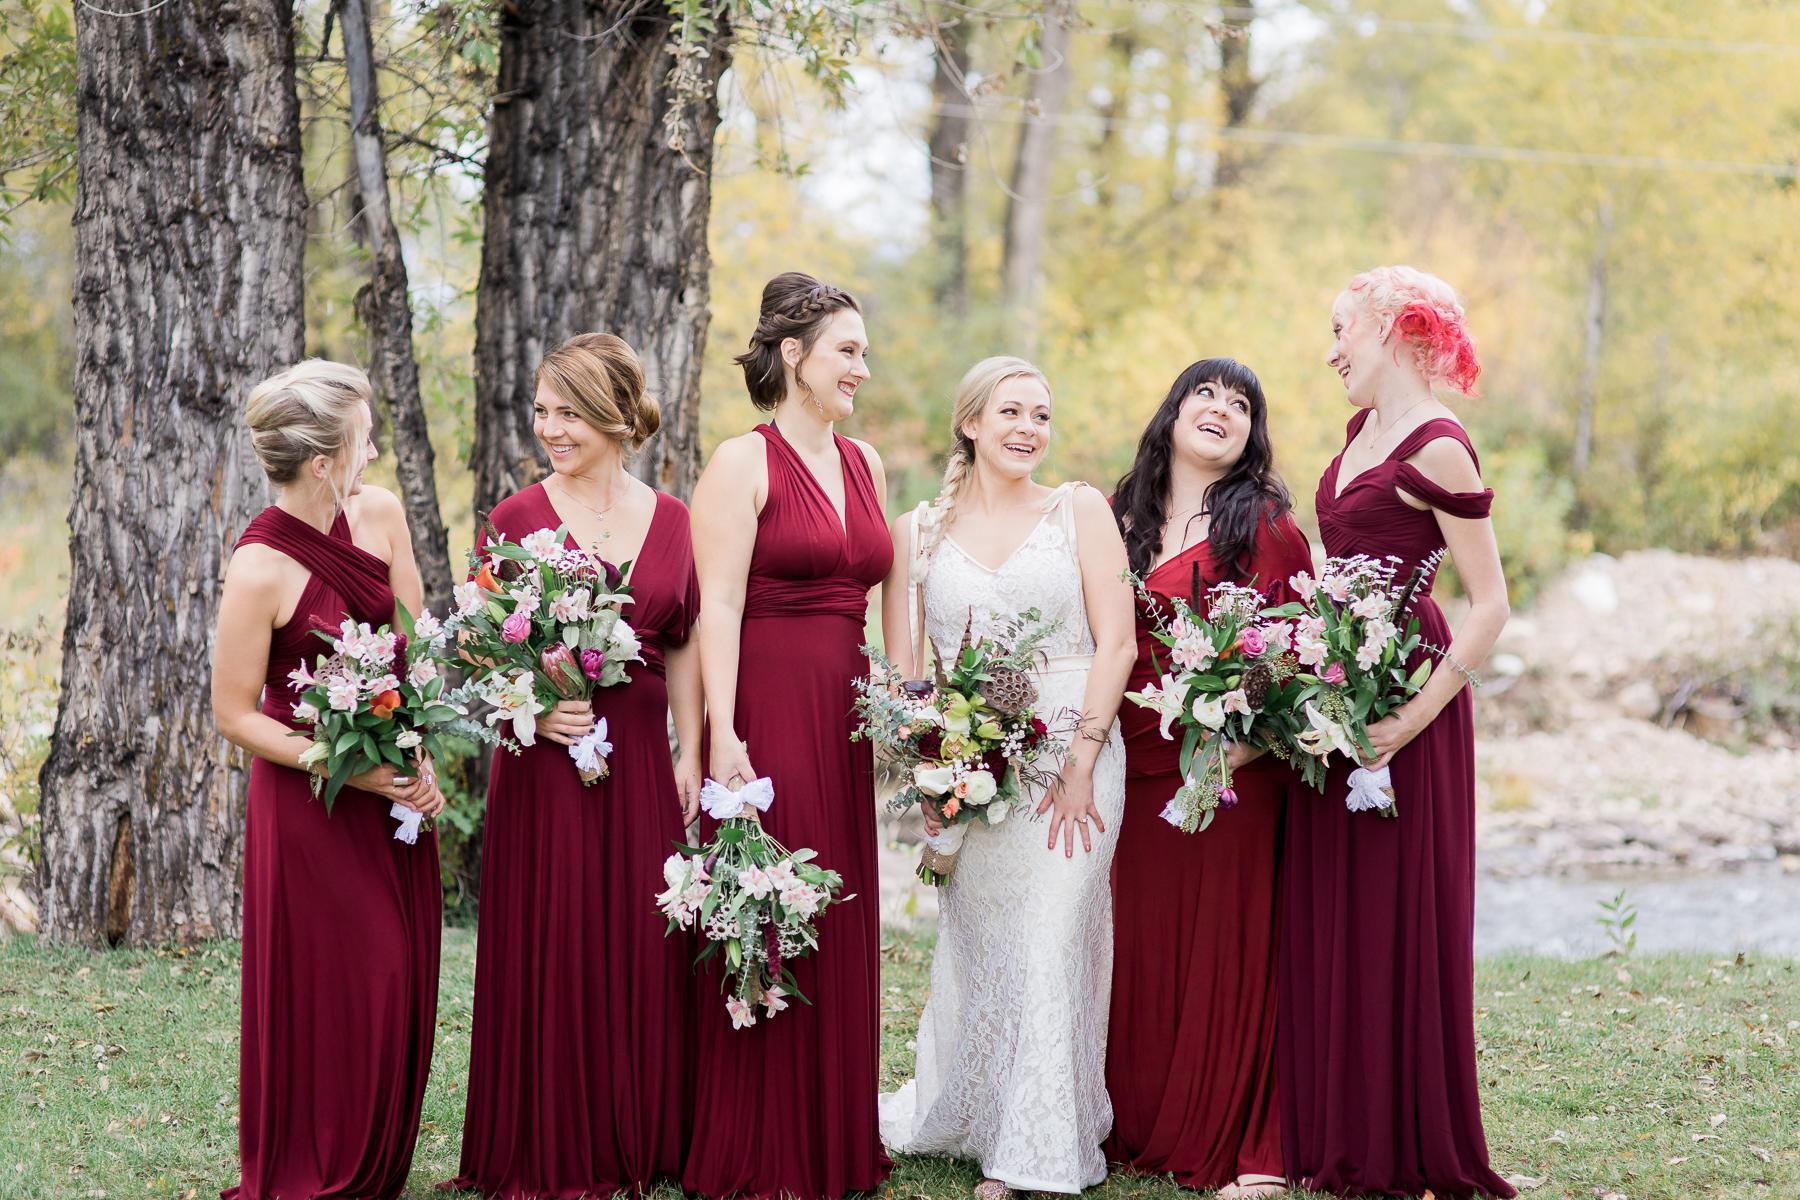 Floor length burgundy bridesmaids gowns